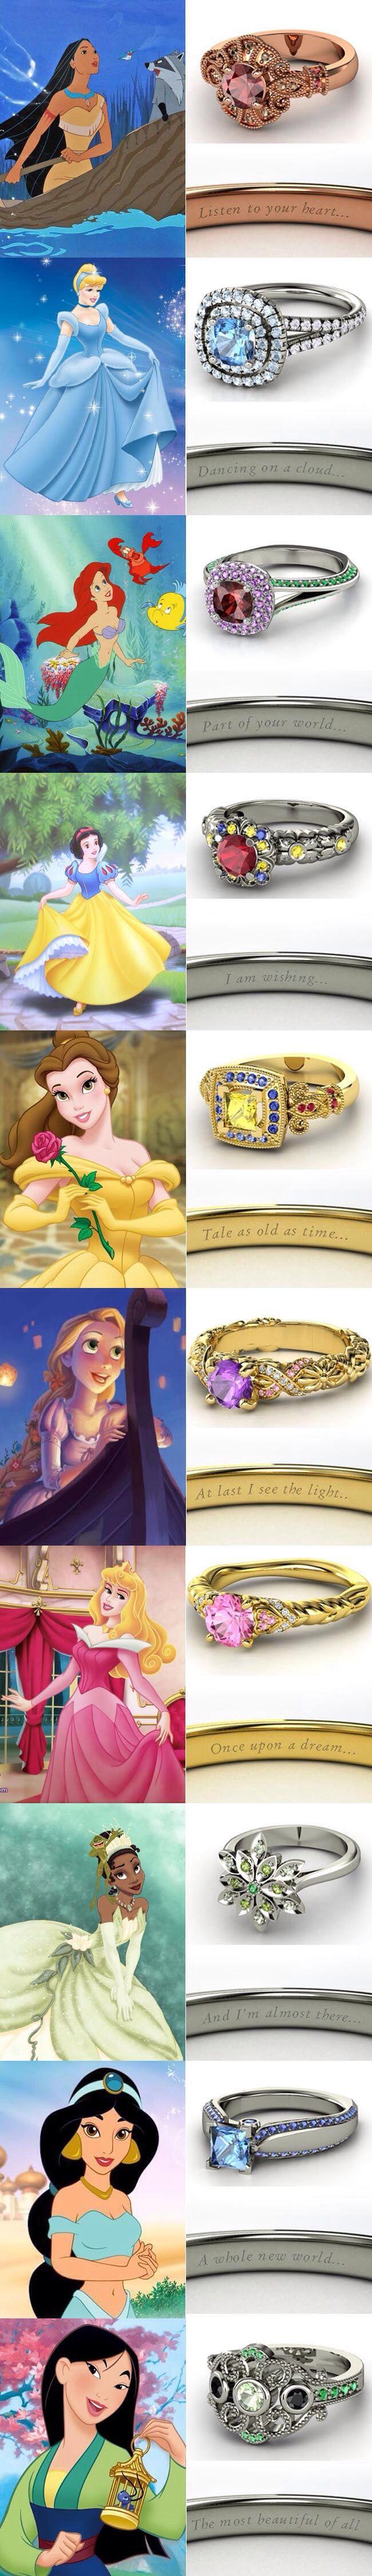 Disney themed wedding rings.